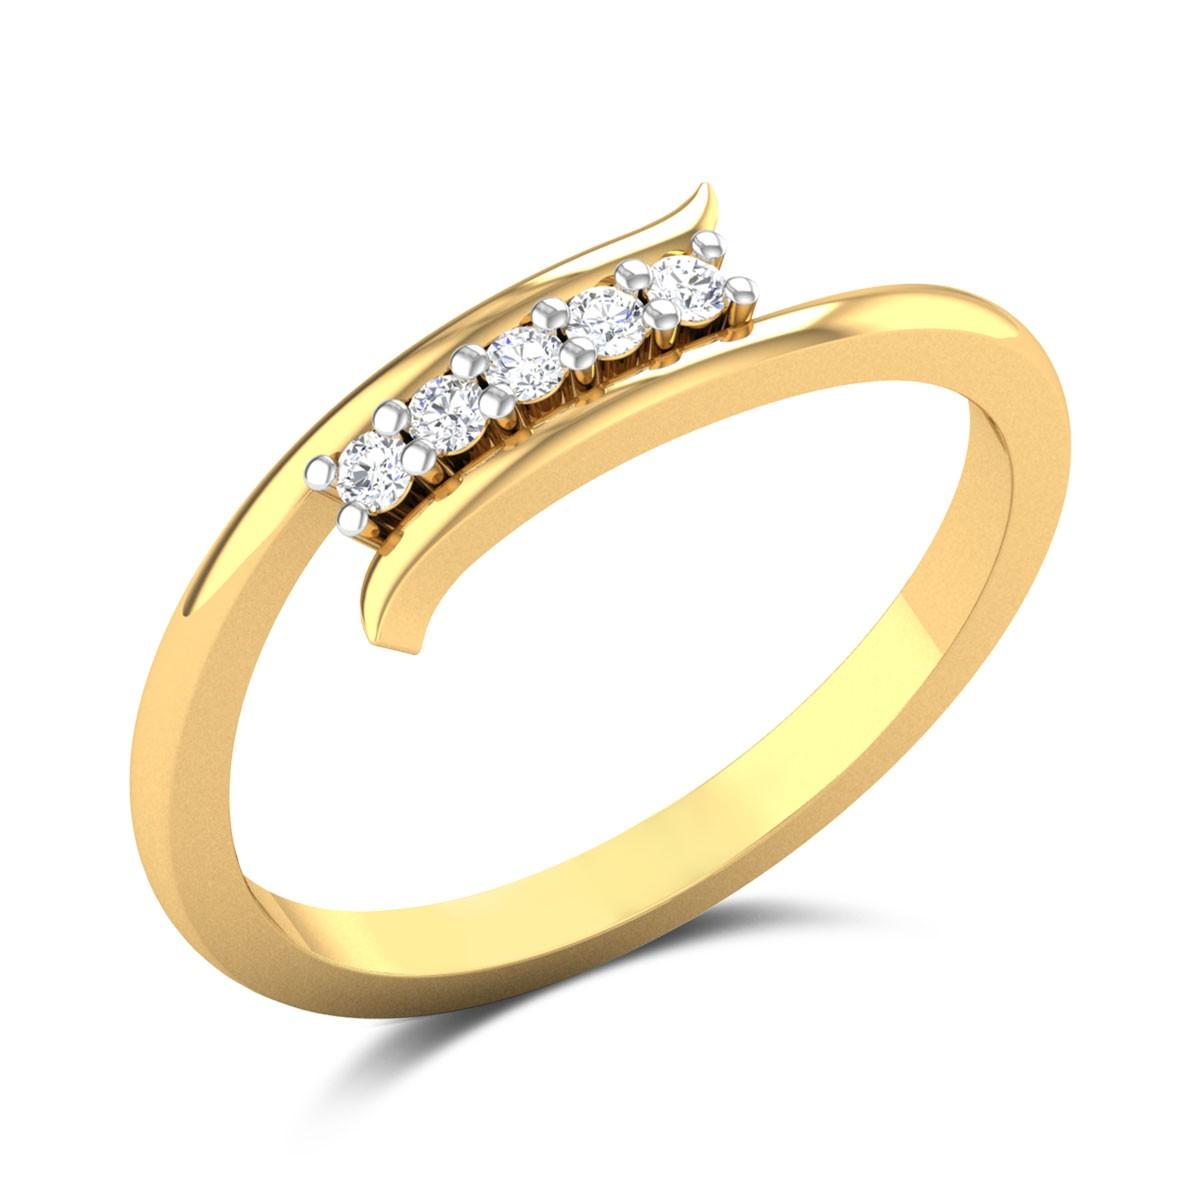 Mazie Diamond Ring